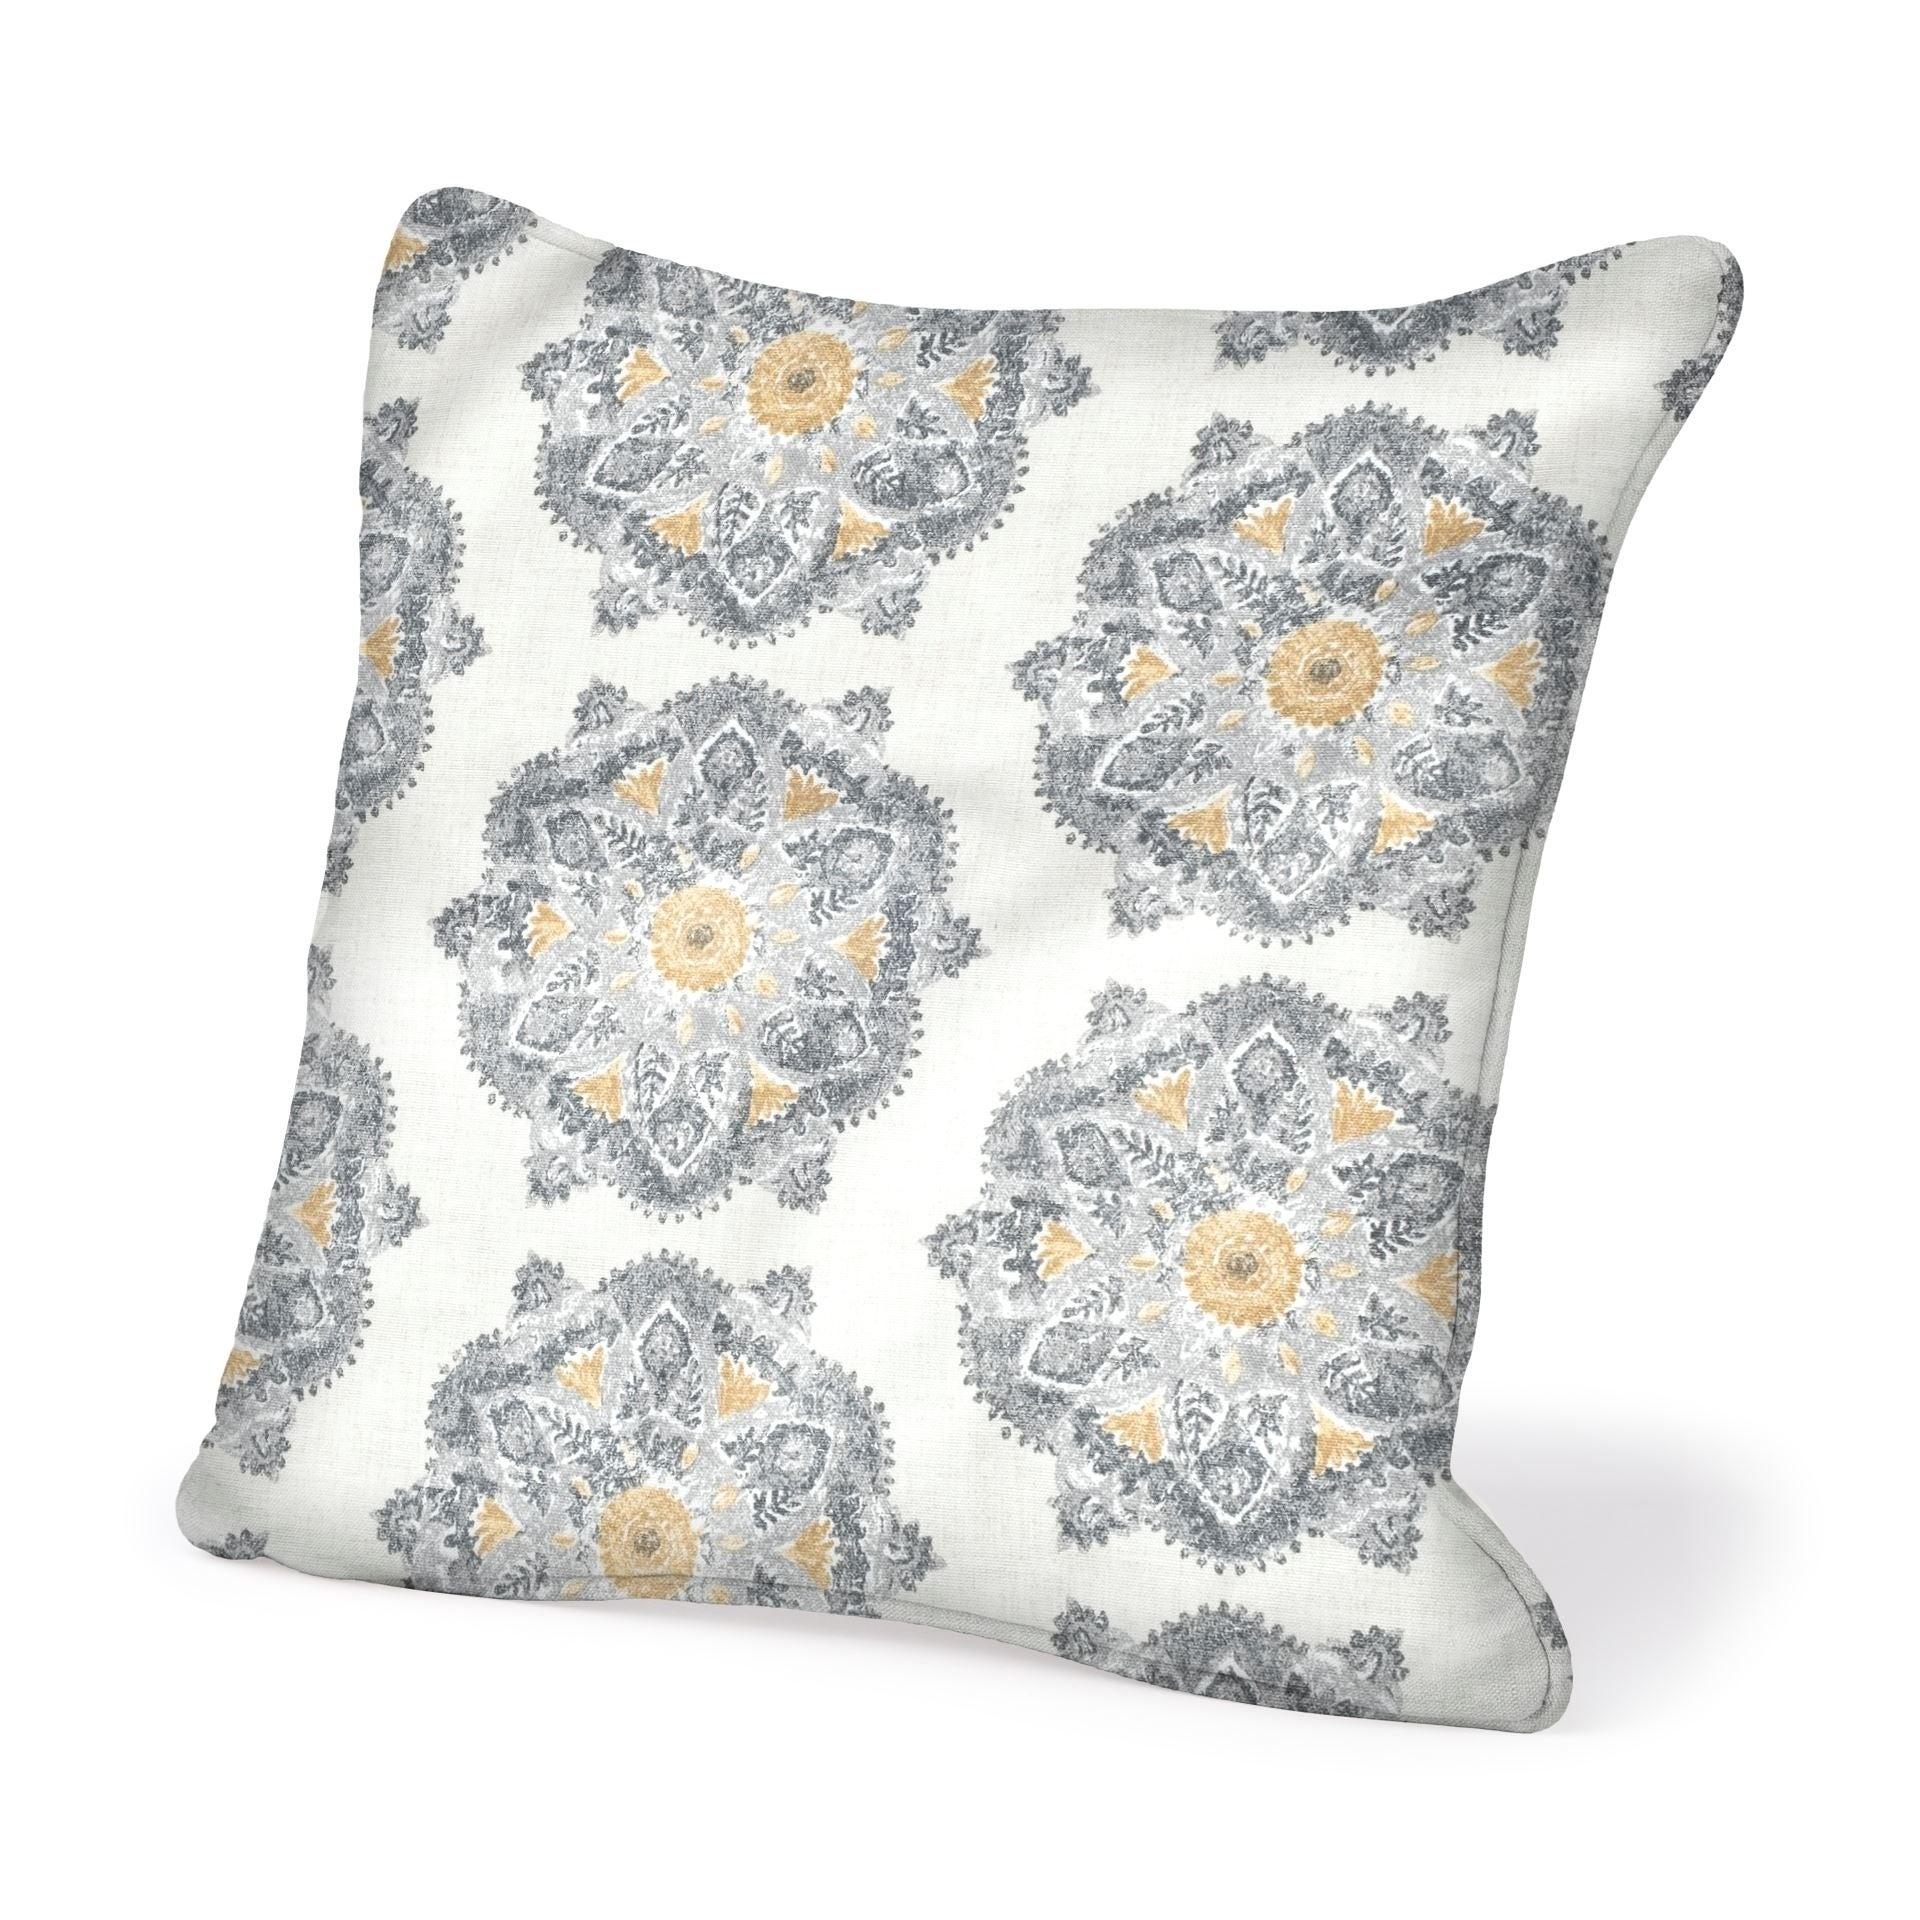 Mercana Coxcomb III 22 x 22 (cover only) Decorative Pillow